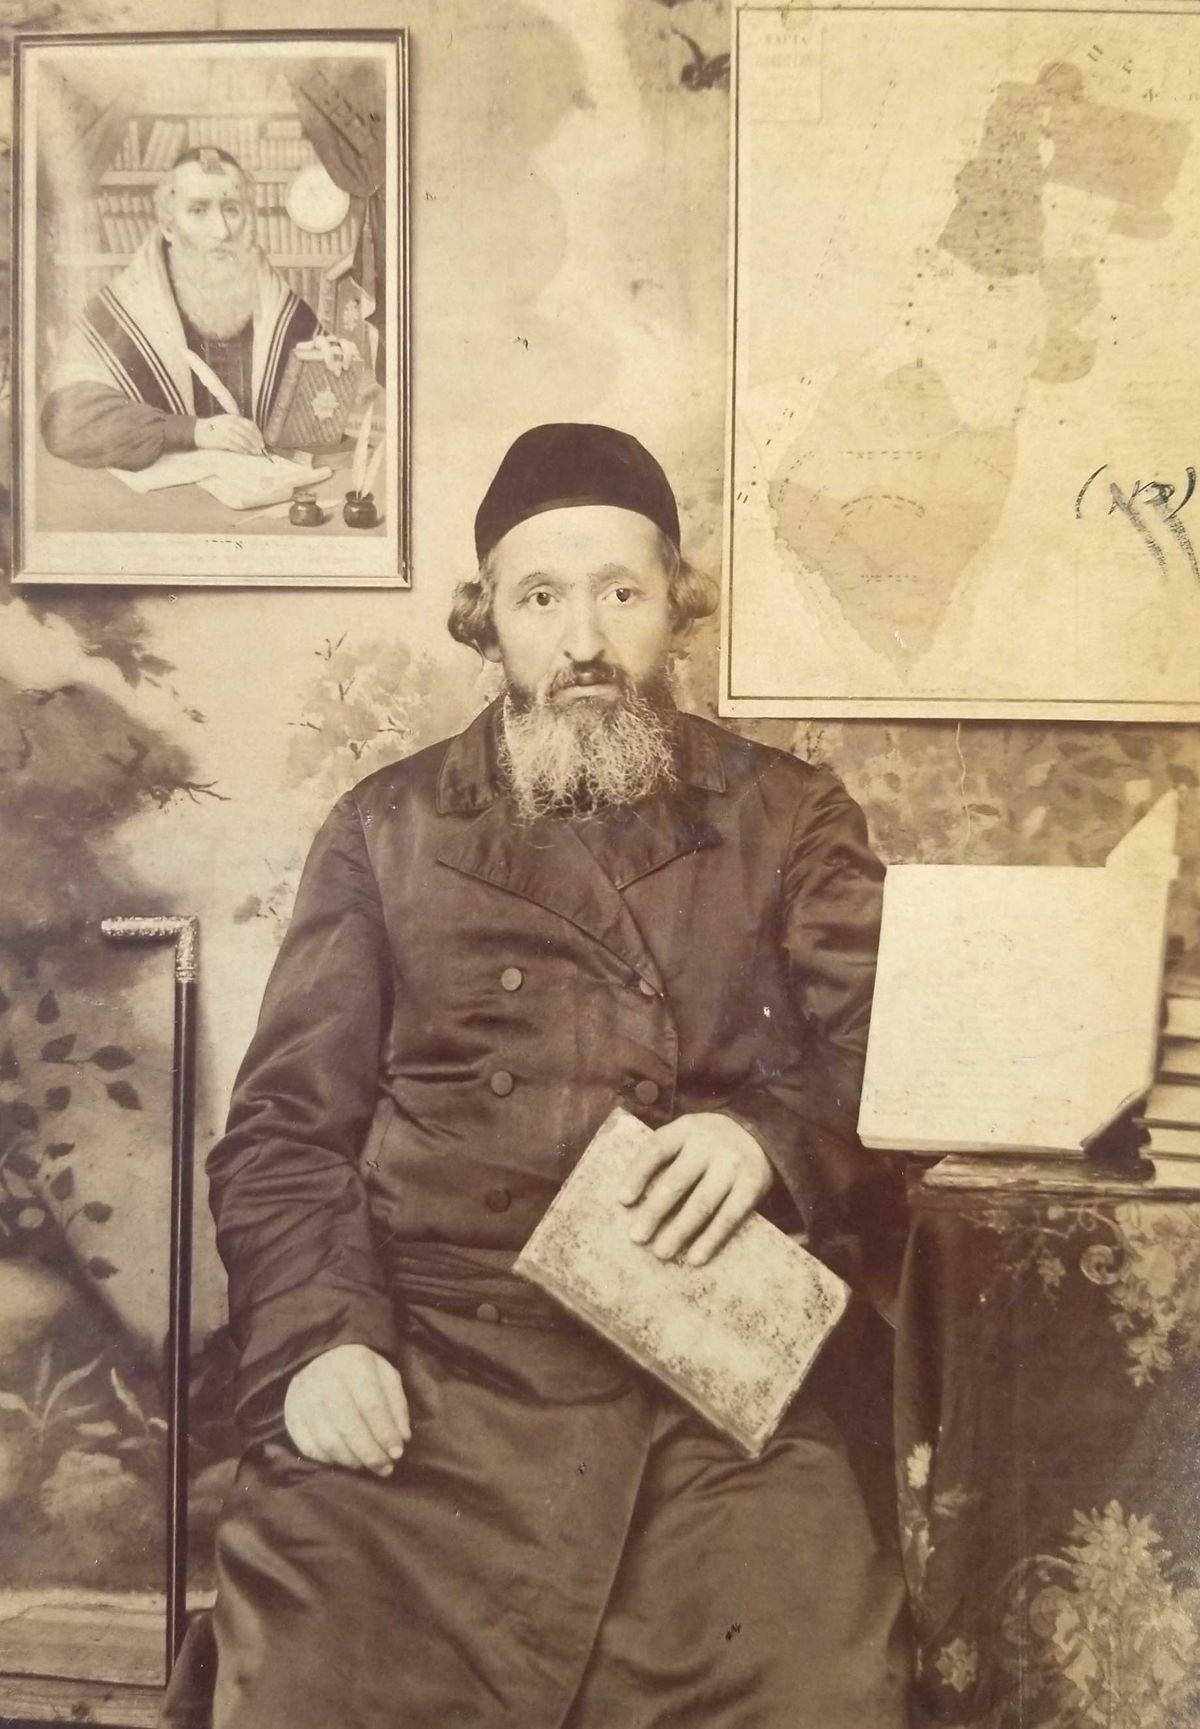 My Great-Grandfather, Rabbi Tzvi Hirsch Lamport, Author of 'Piskei ha-Gra'